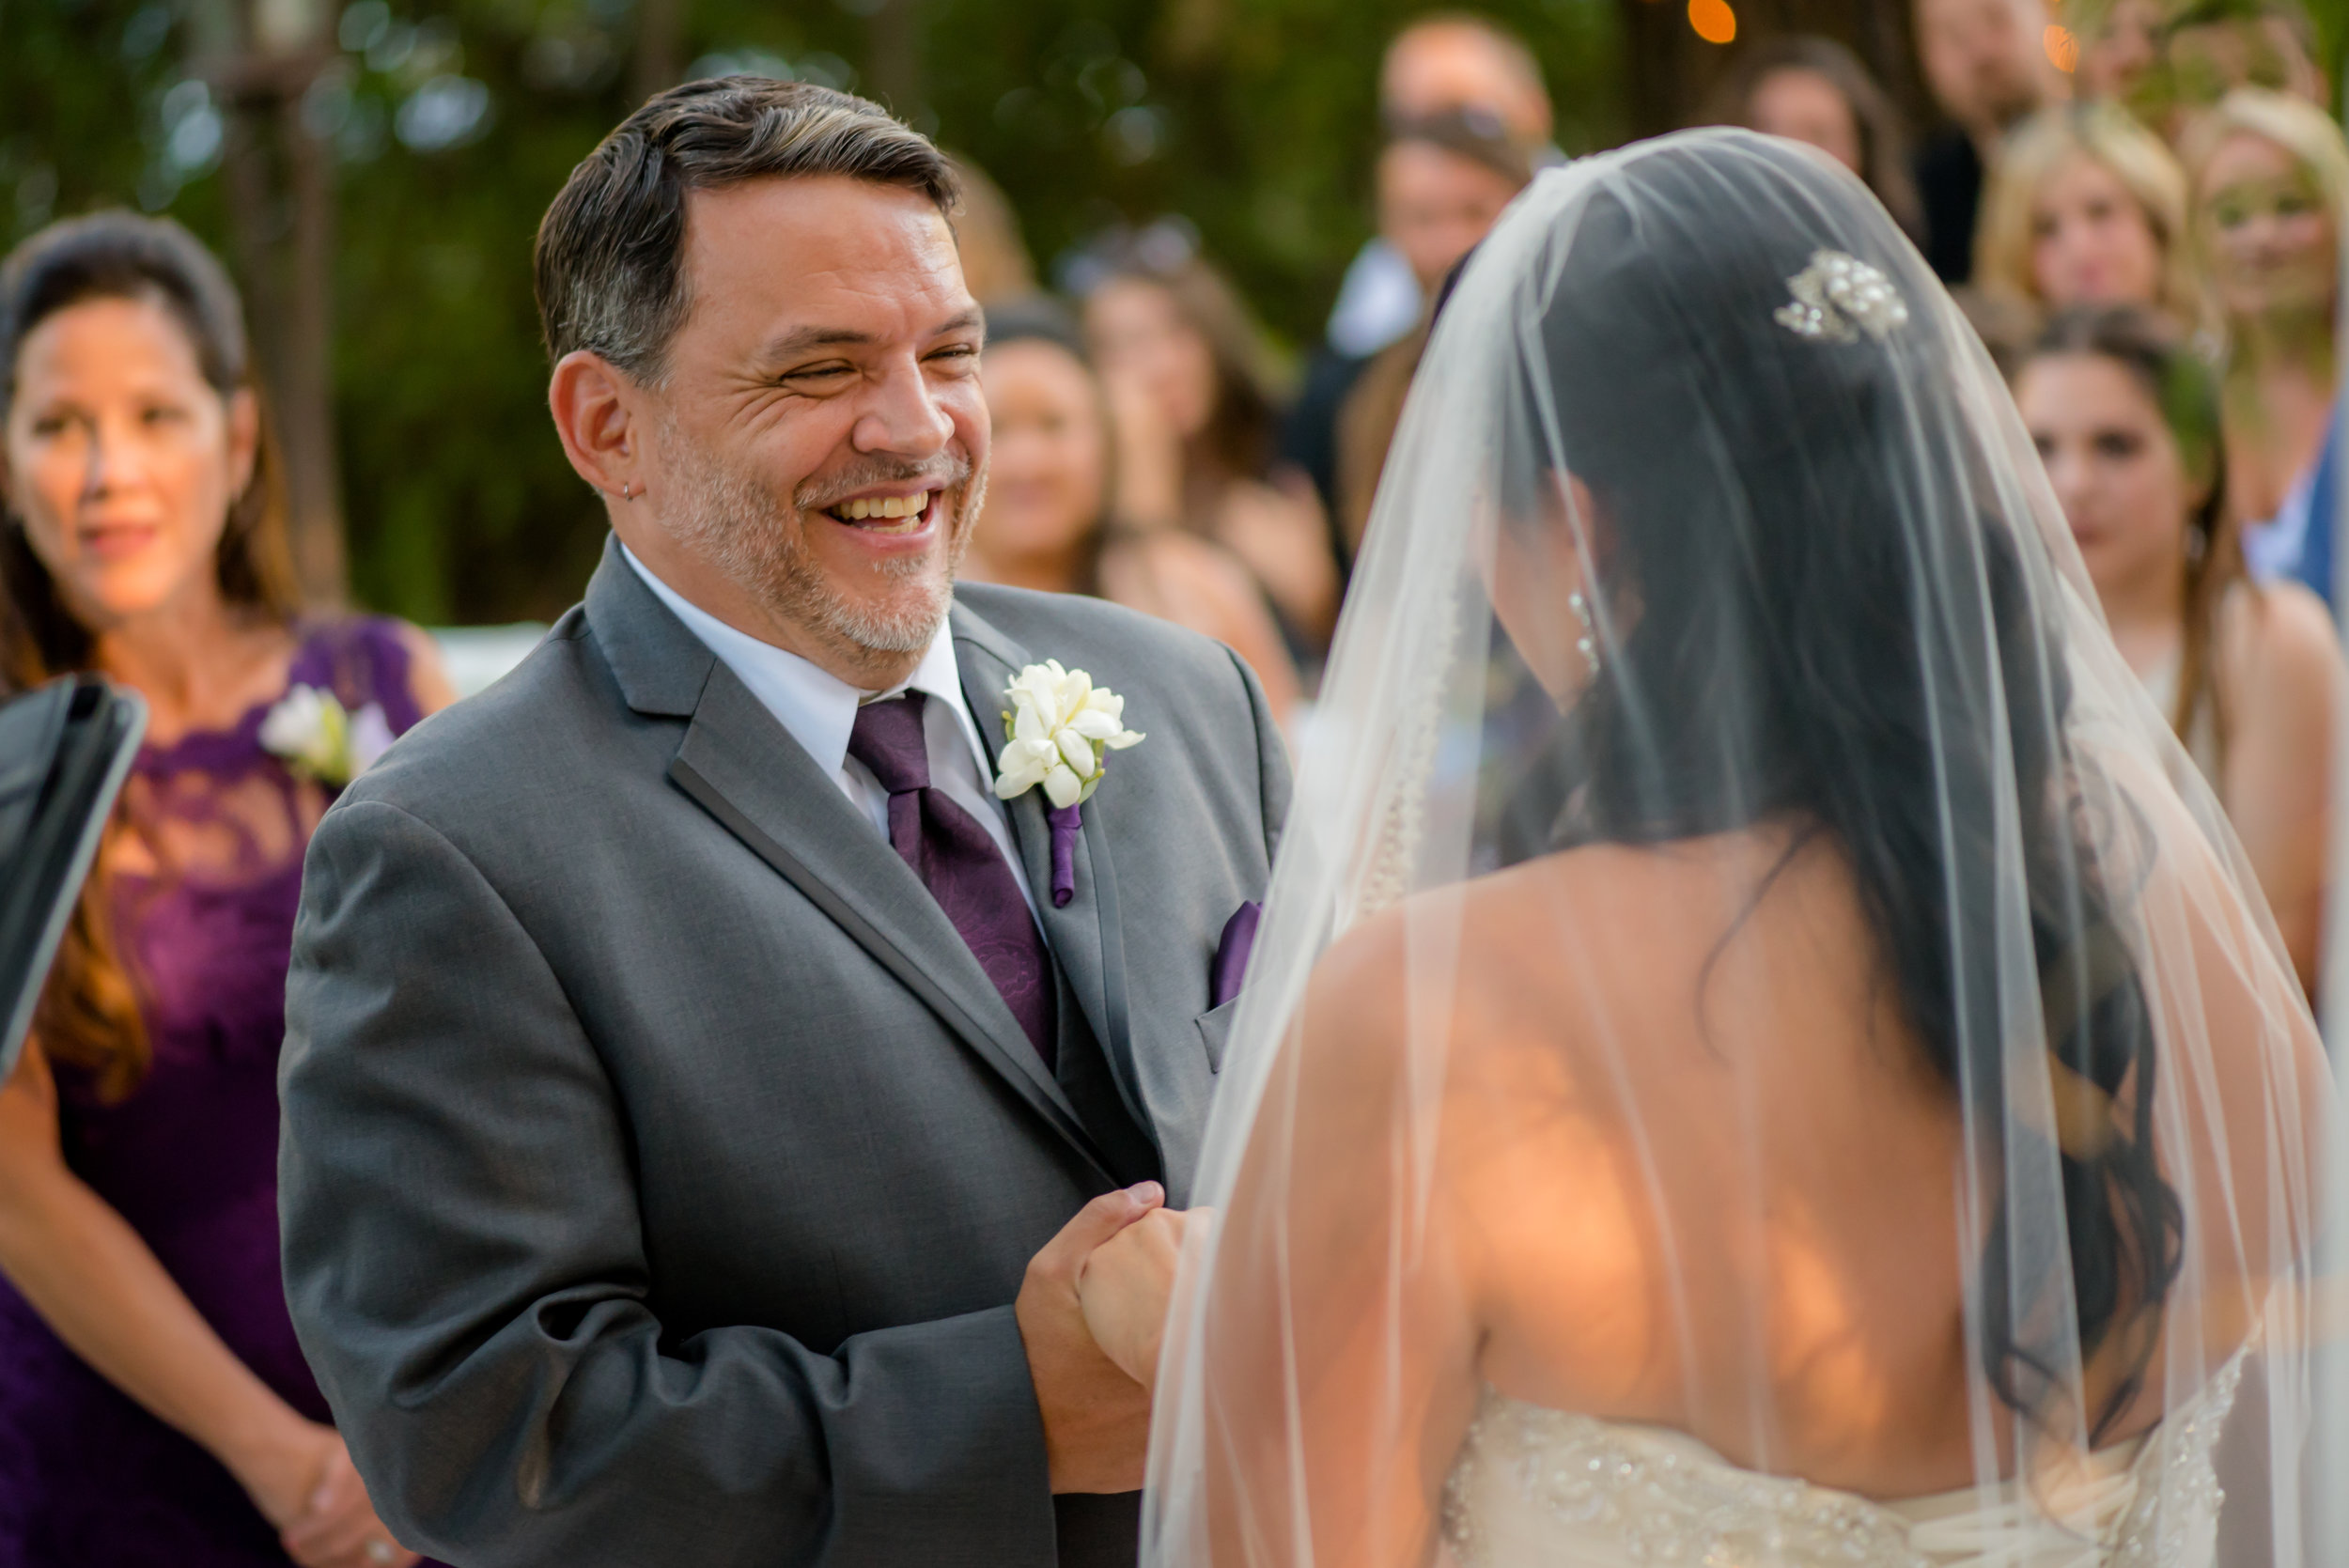 erika-seth-019-monte-verde-inn-sacramento-wedding-photographer-katherine-nicole-photography.JPG